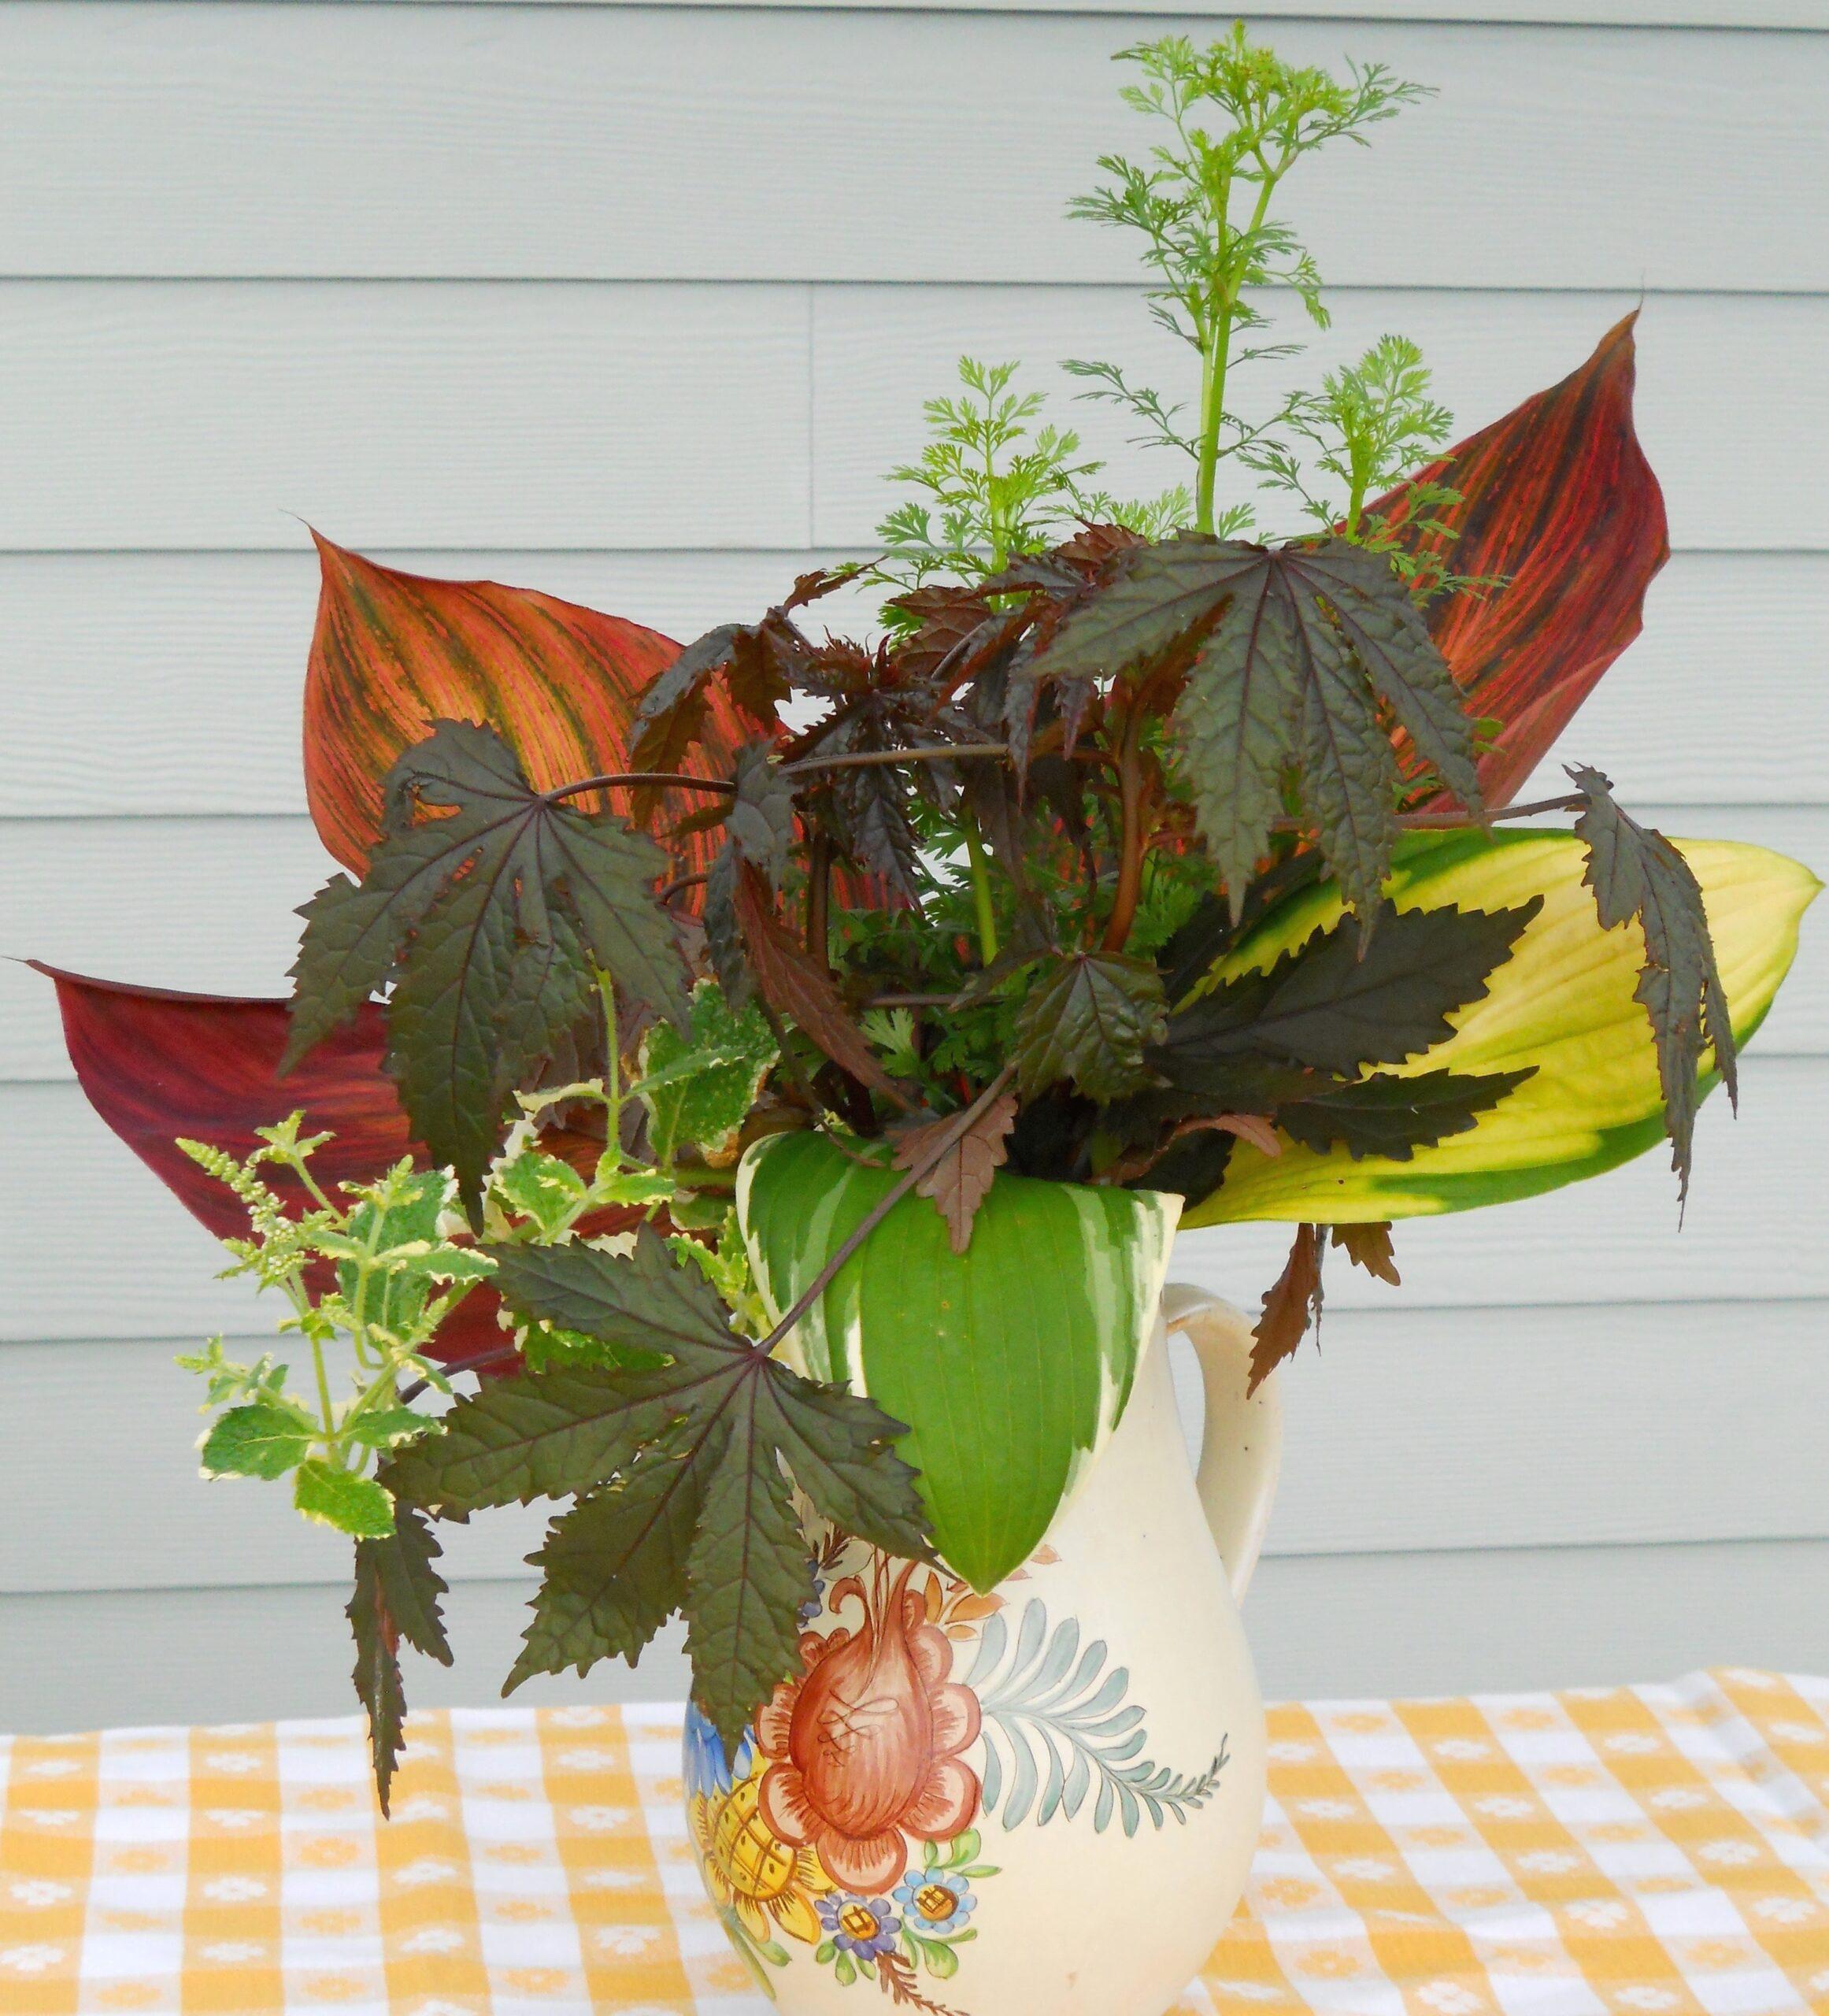 All foliage arrangement